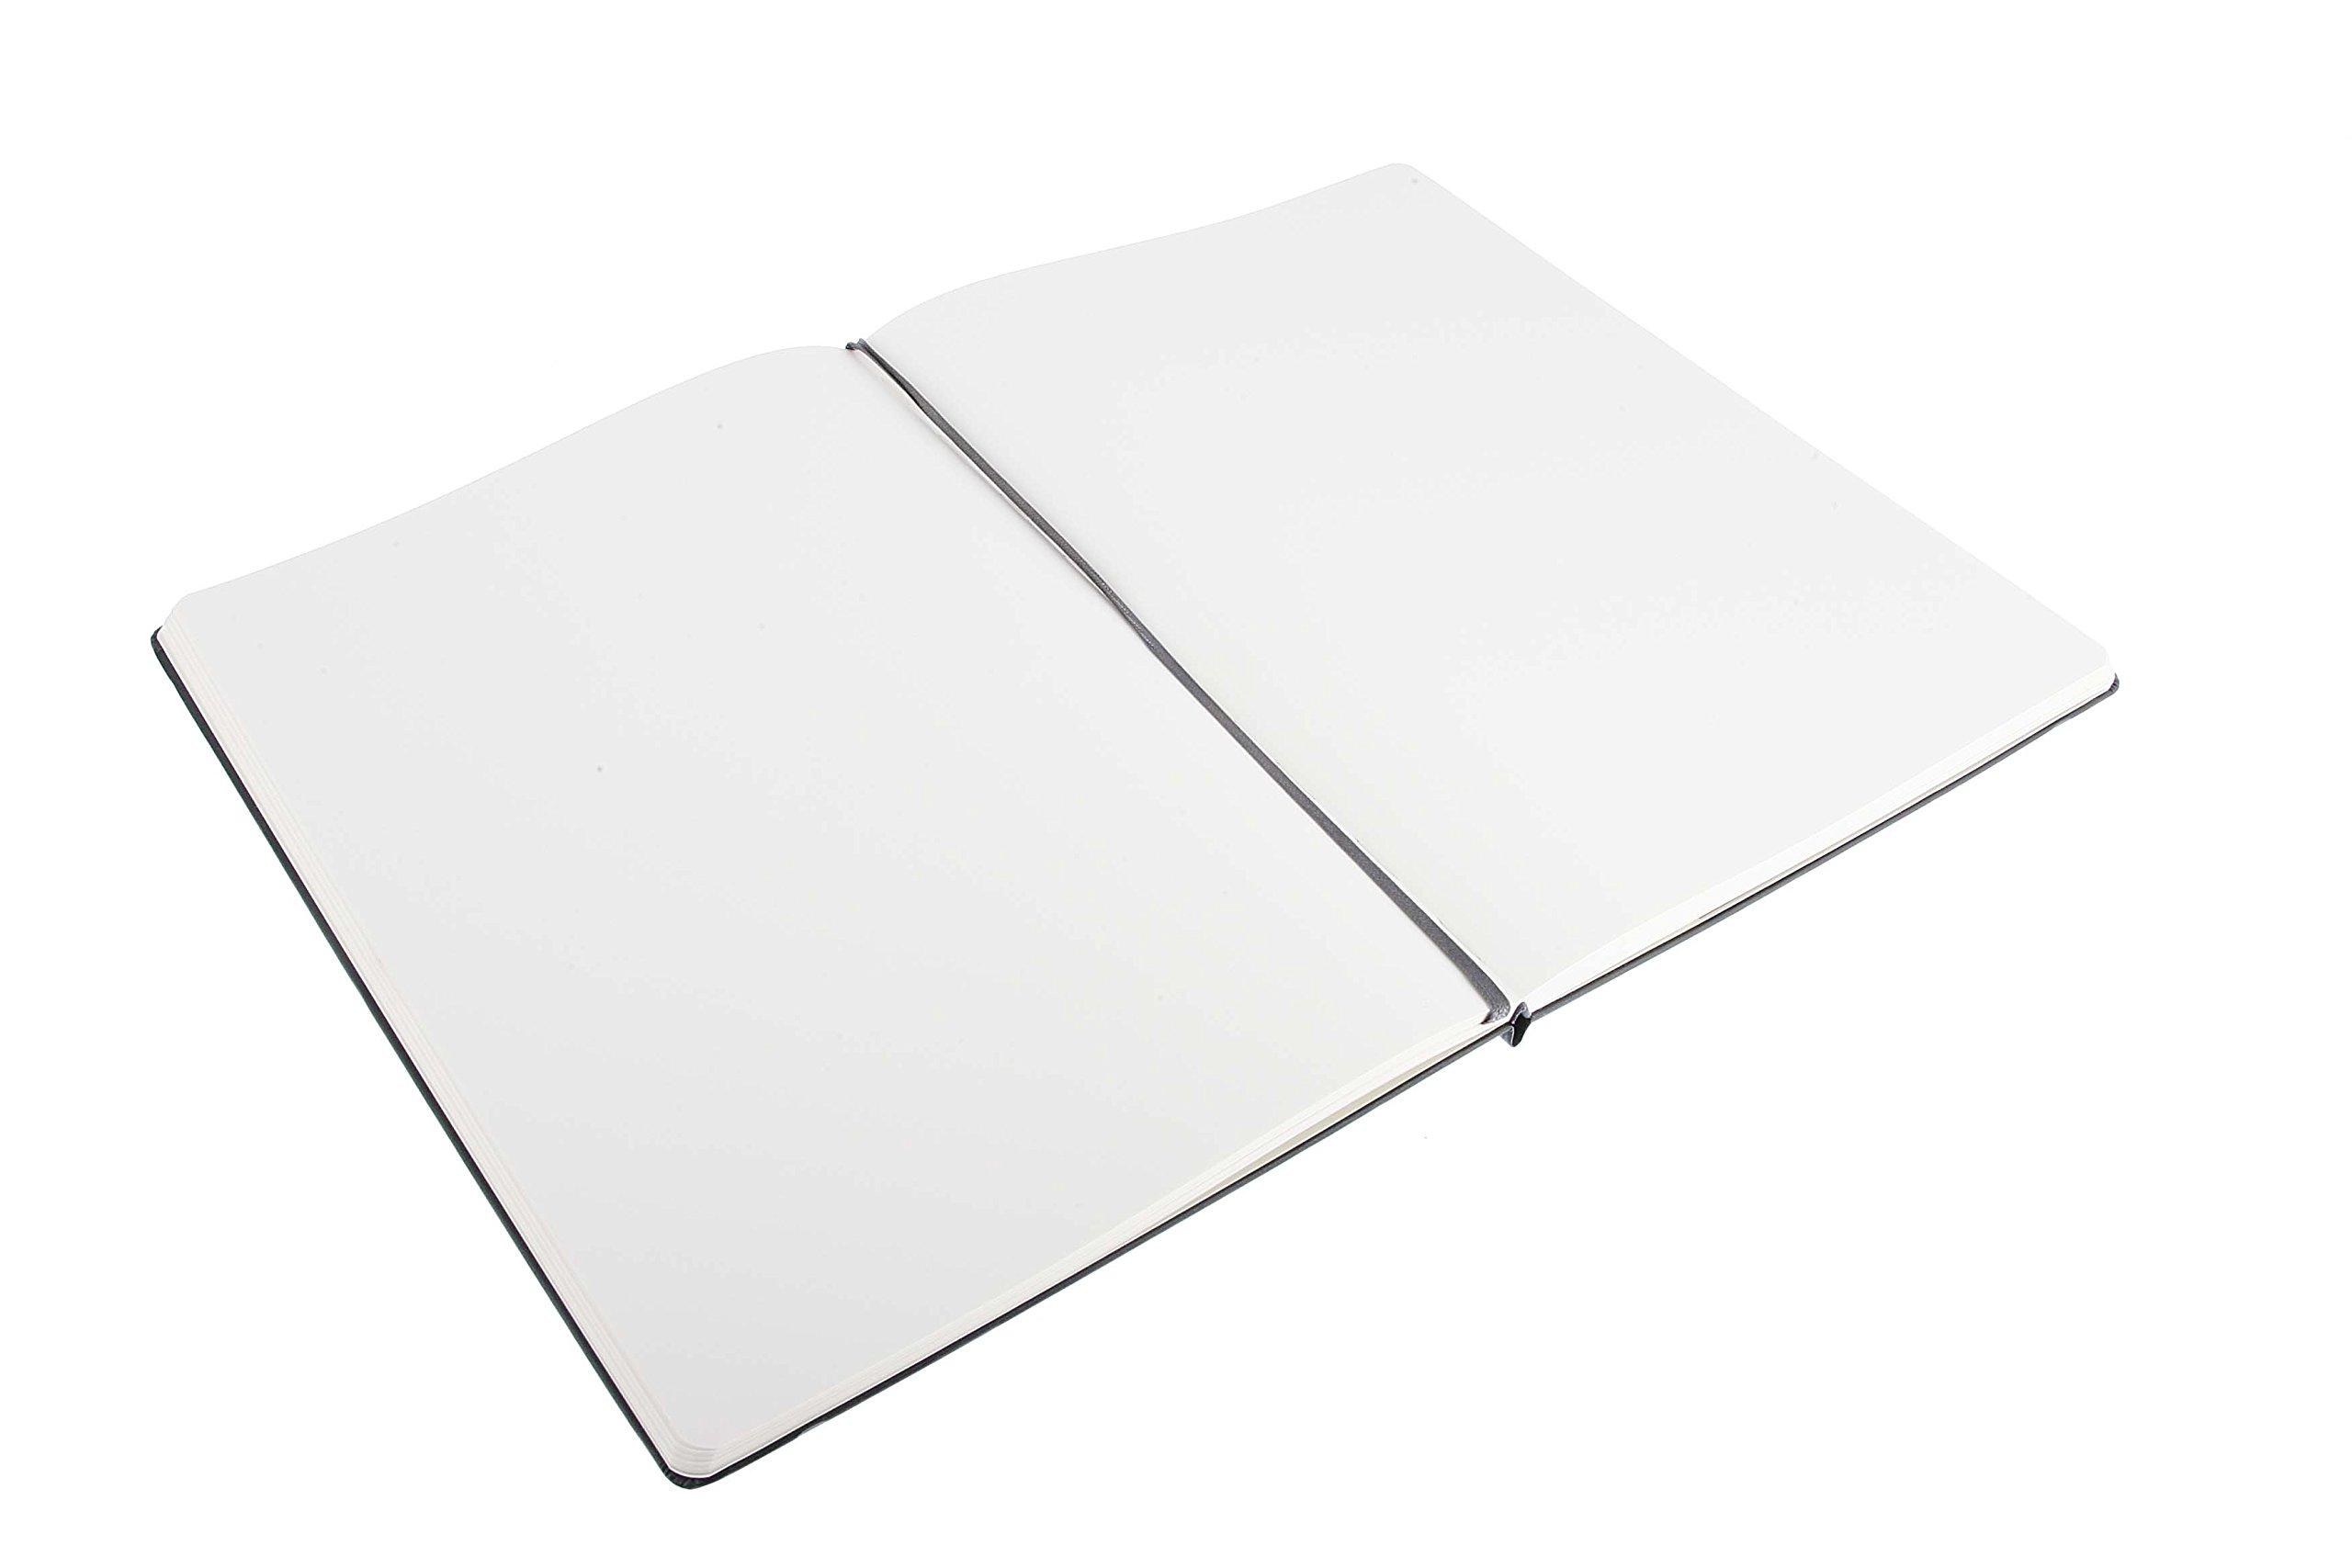 Moleskine Folio Professional Notebook, A4, Plain, Black, Hard Cover (8.25 x 11.75) (Professional Folio Series)